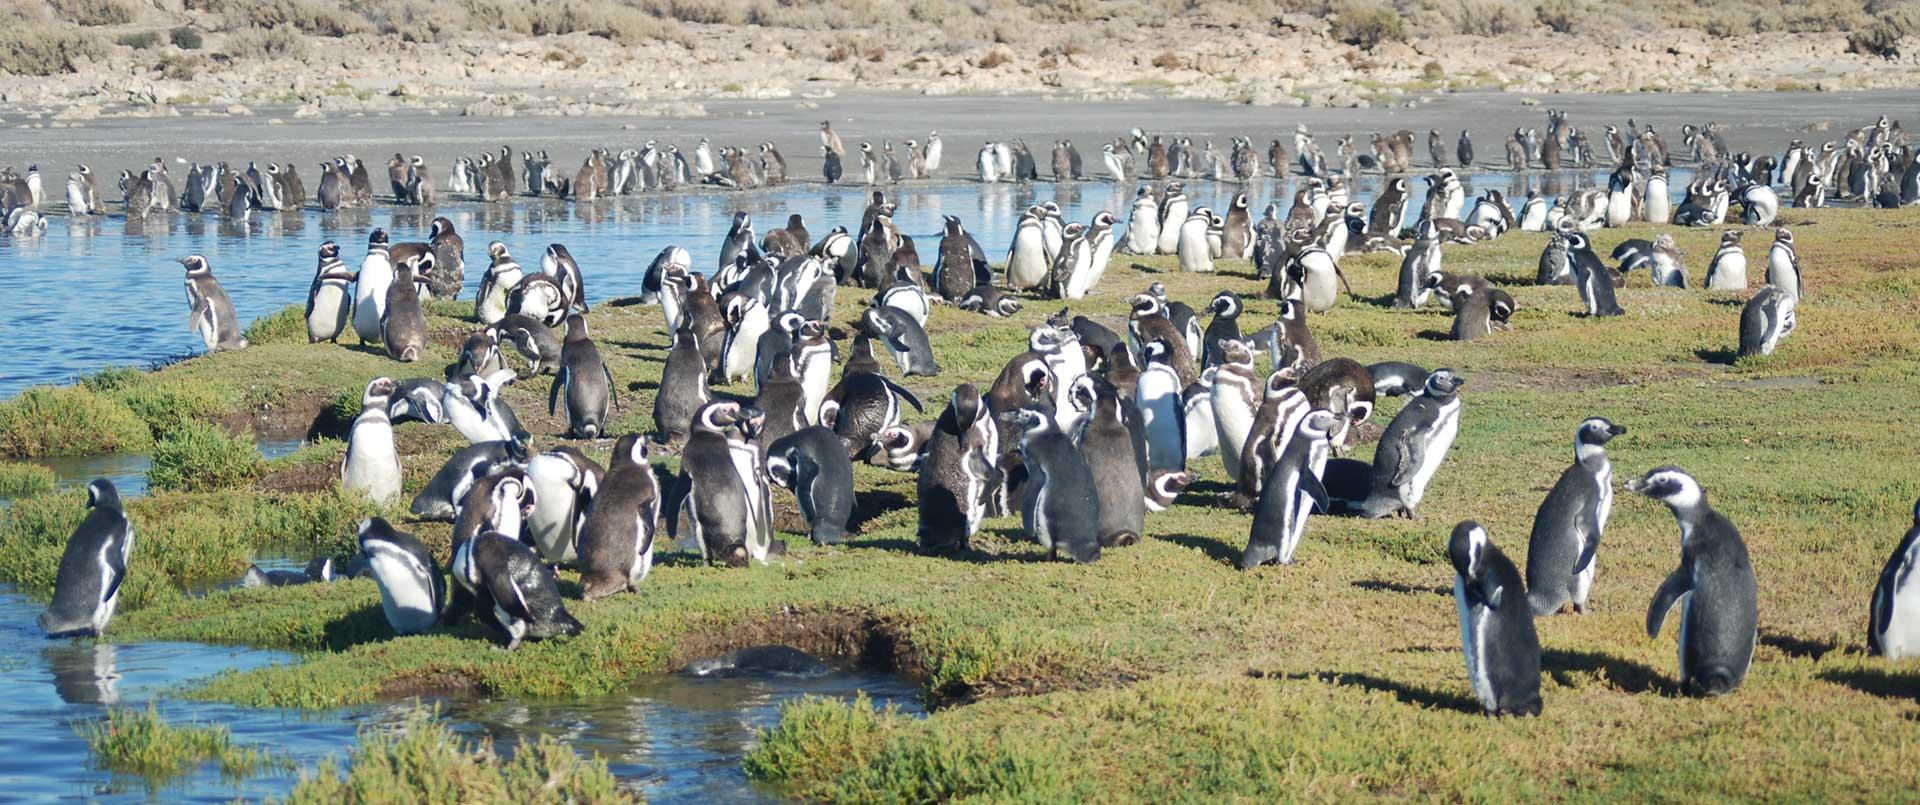 Bahia Bustamante, Patagonia